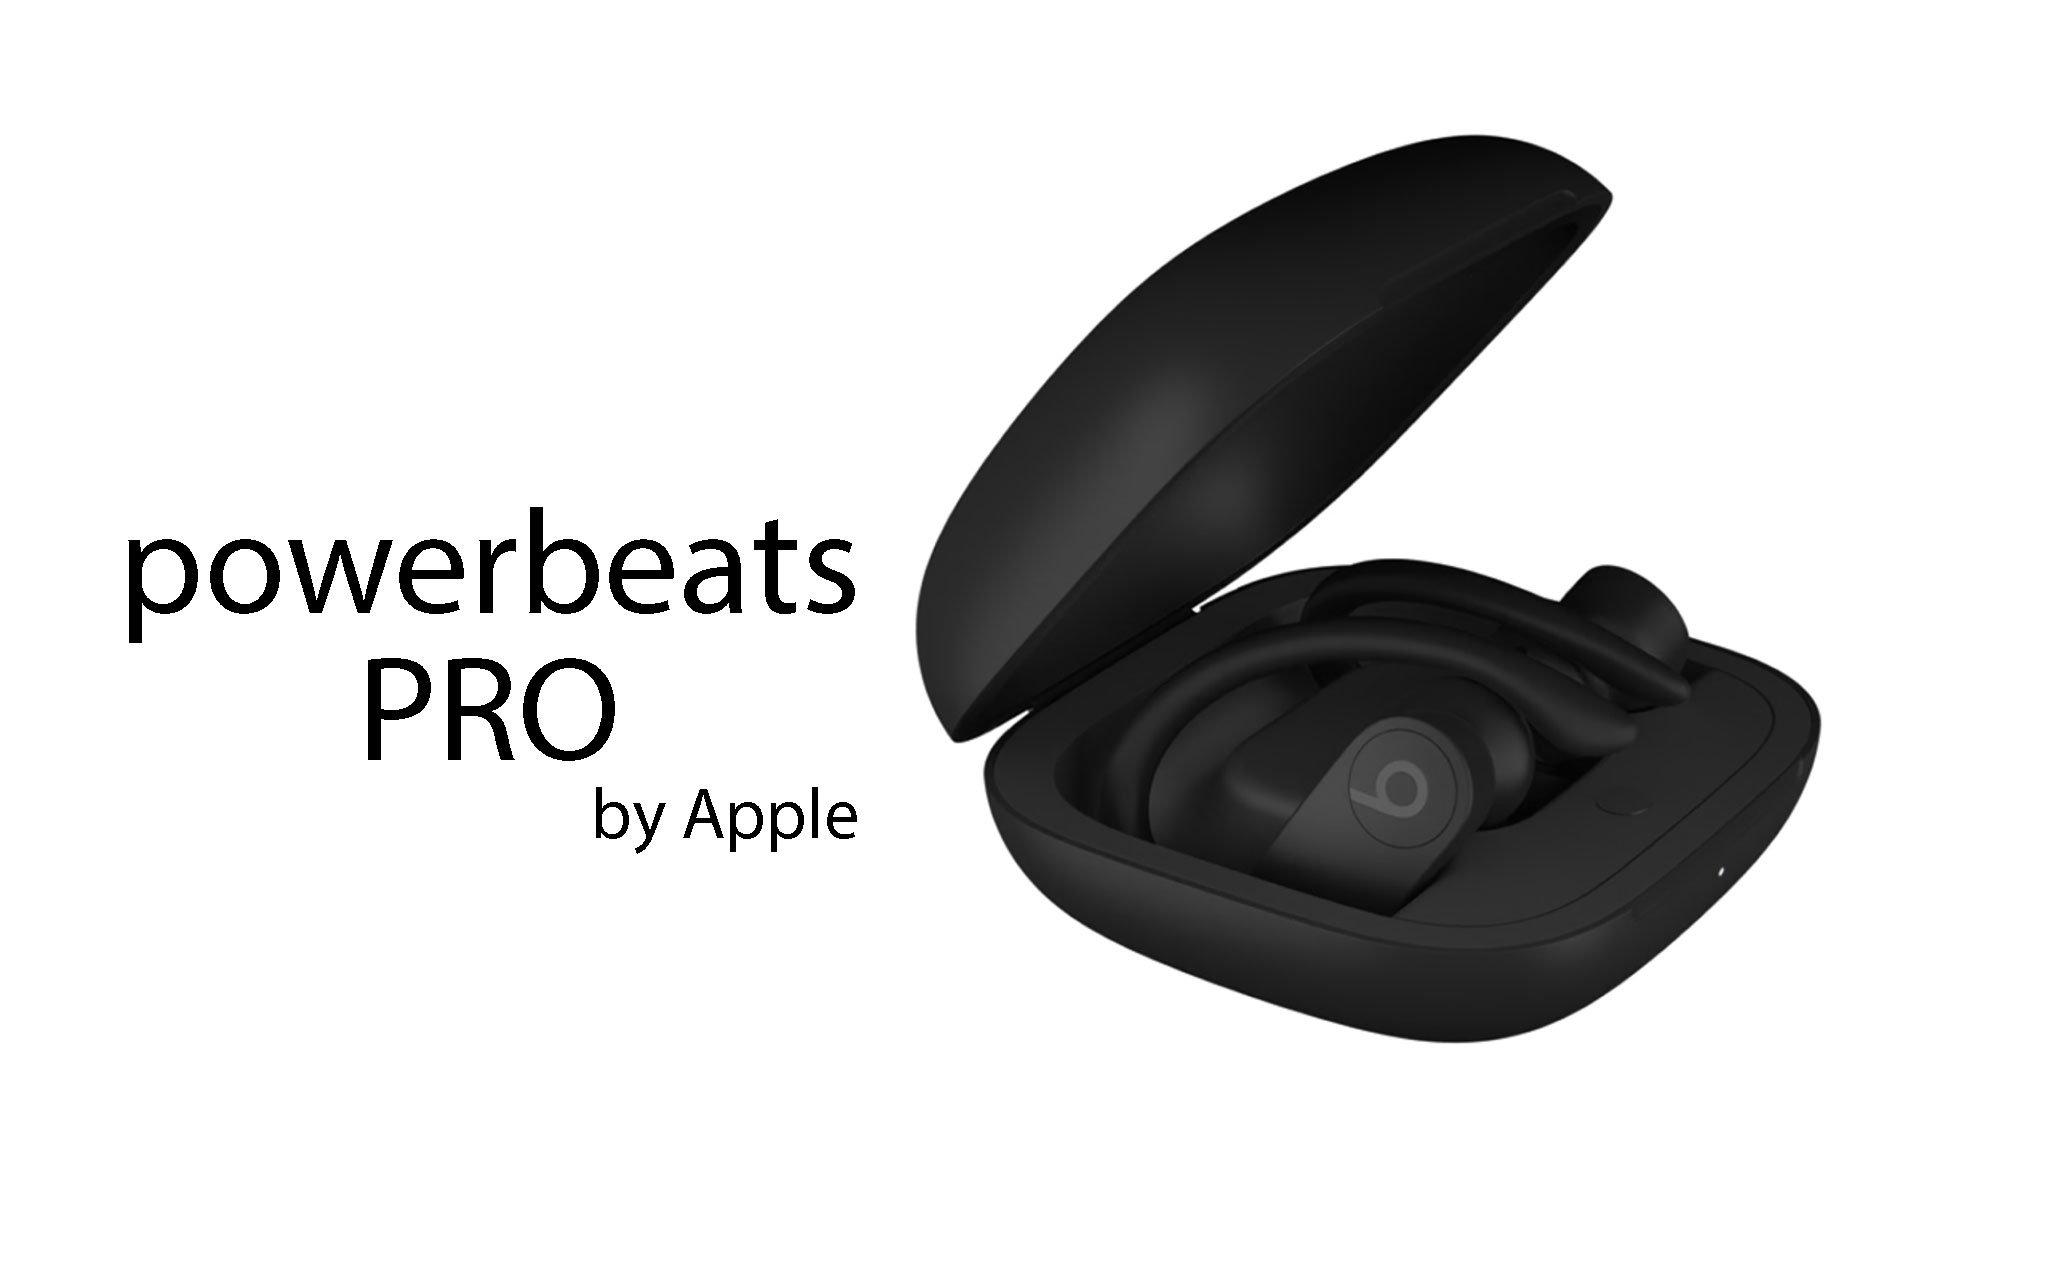 Powerbeats Pro 3